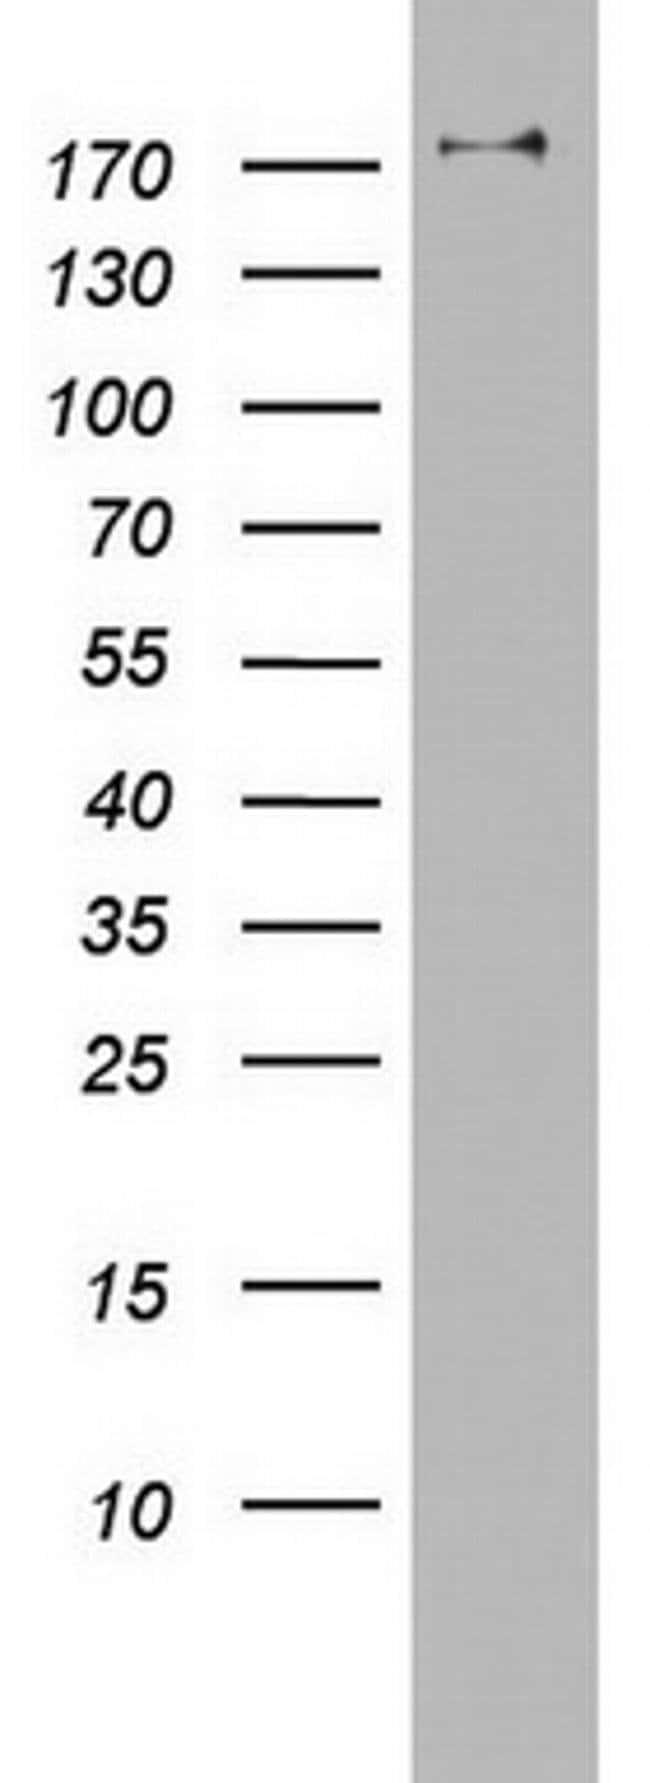 PIK3C2A Mouse anti-Human, Clone: OTI2C2, Invitrogen 100 µL; Unconjugated